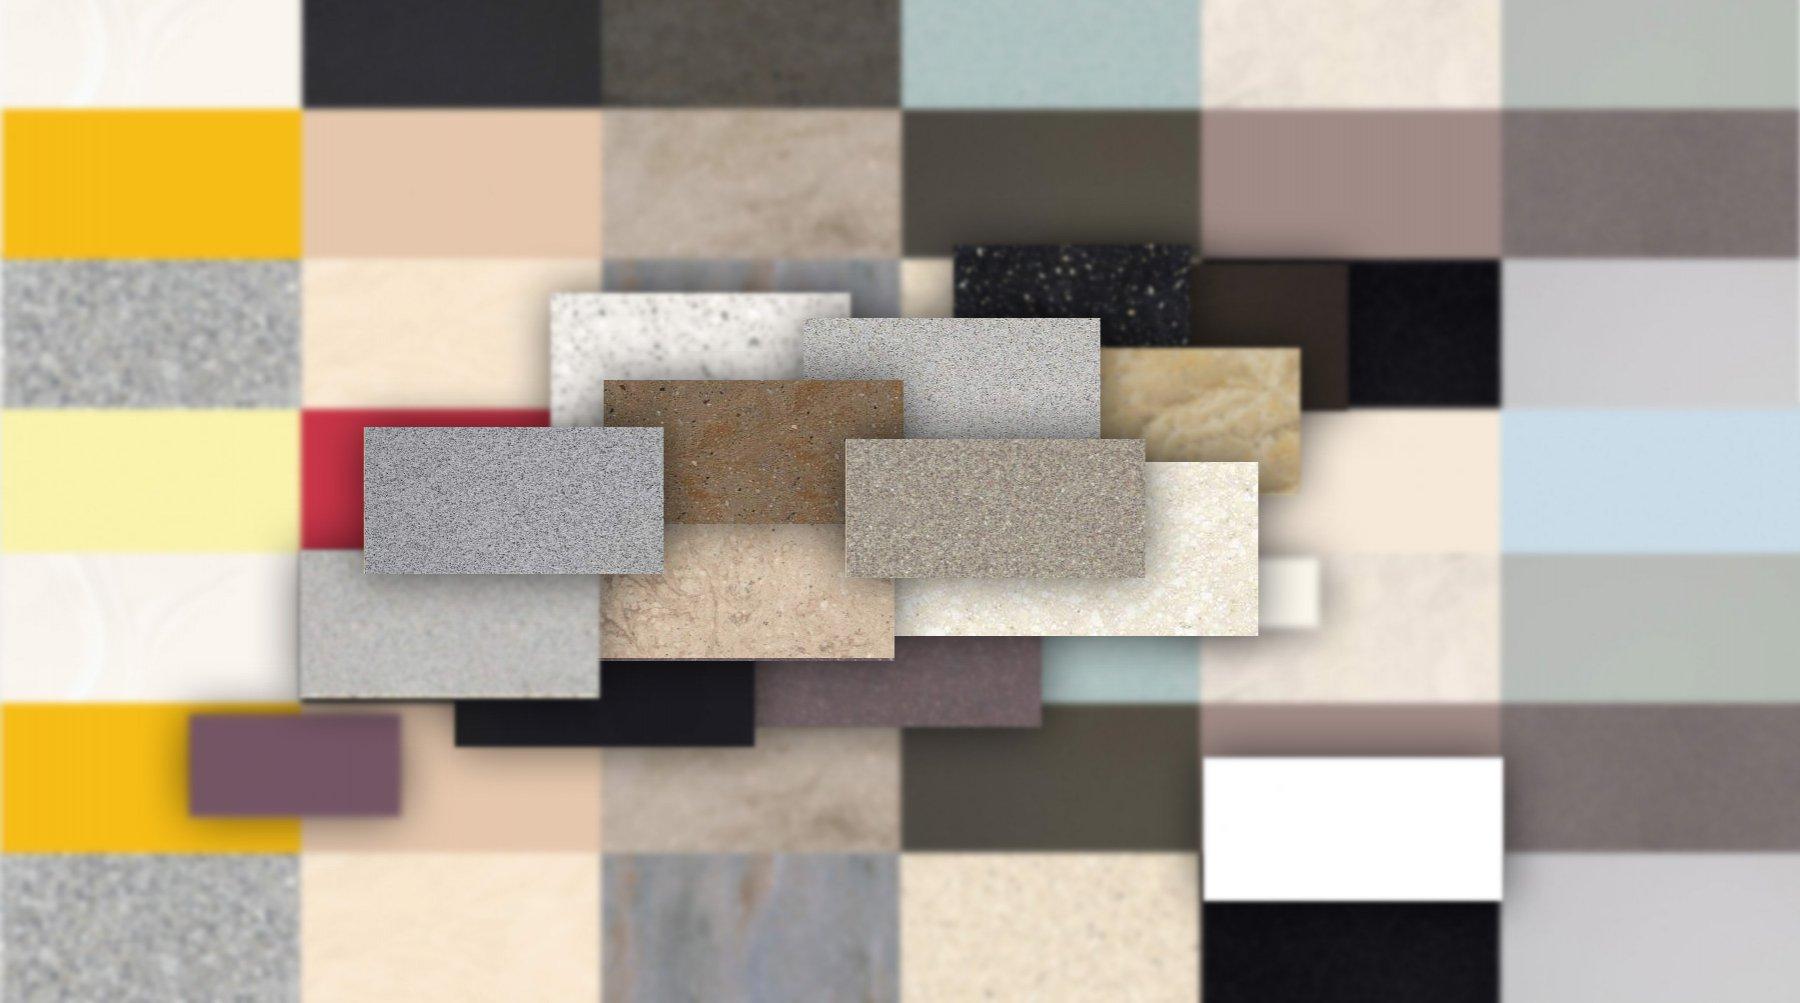 Credence Corian Sur Mesure les couleurs de corian® - corian® solid surfaces, corian®